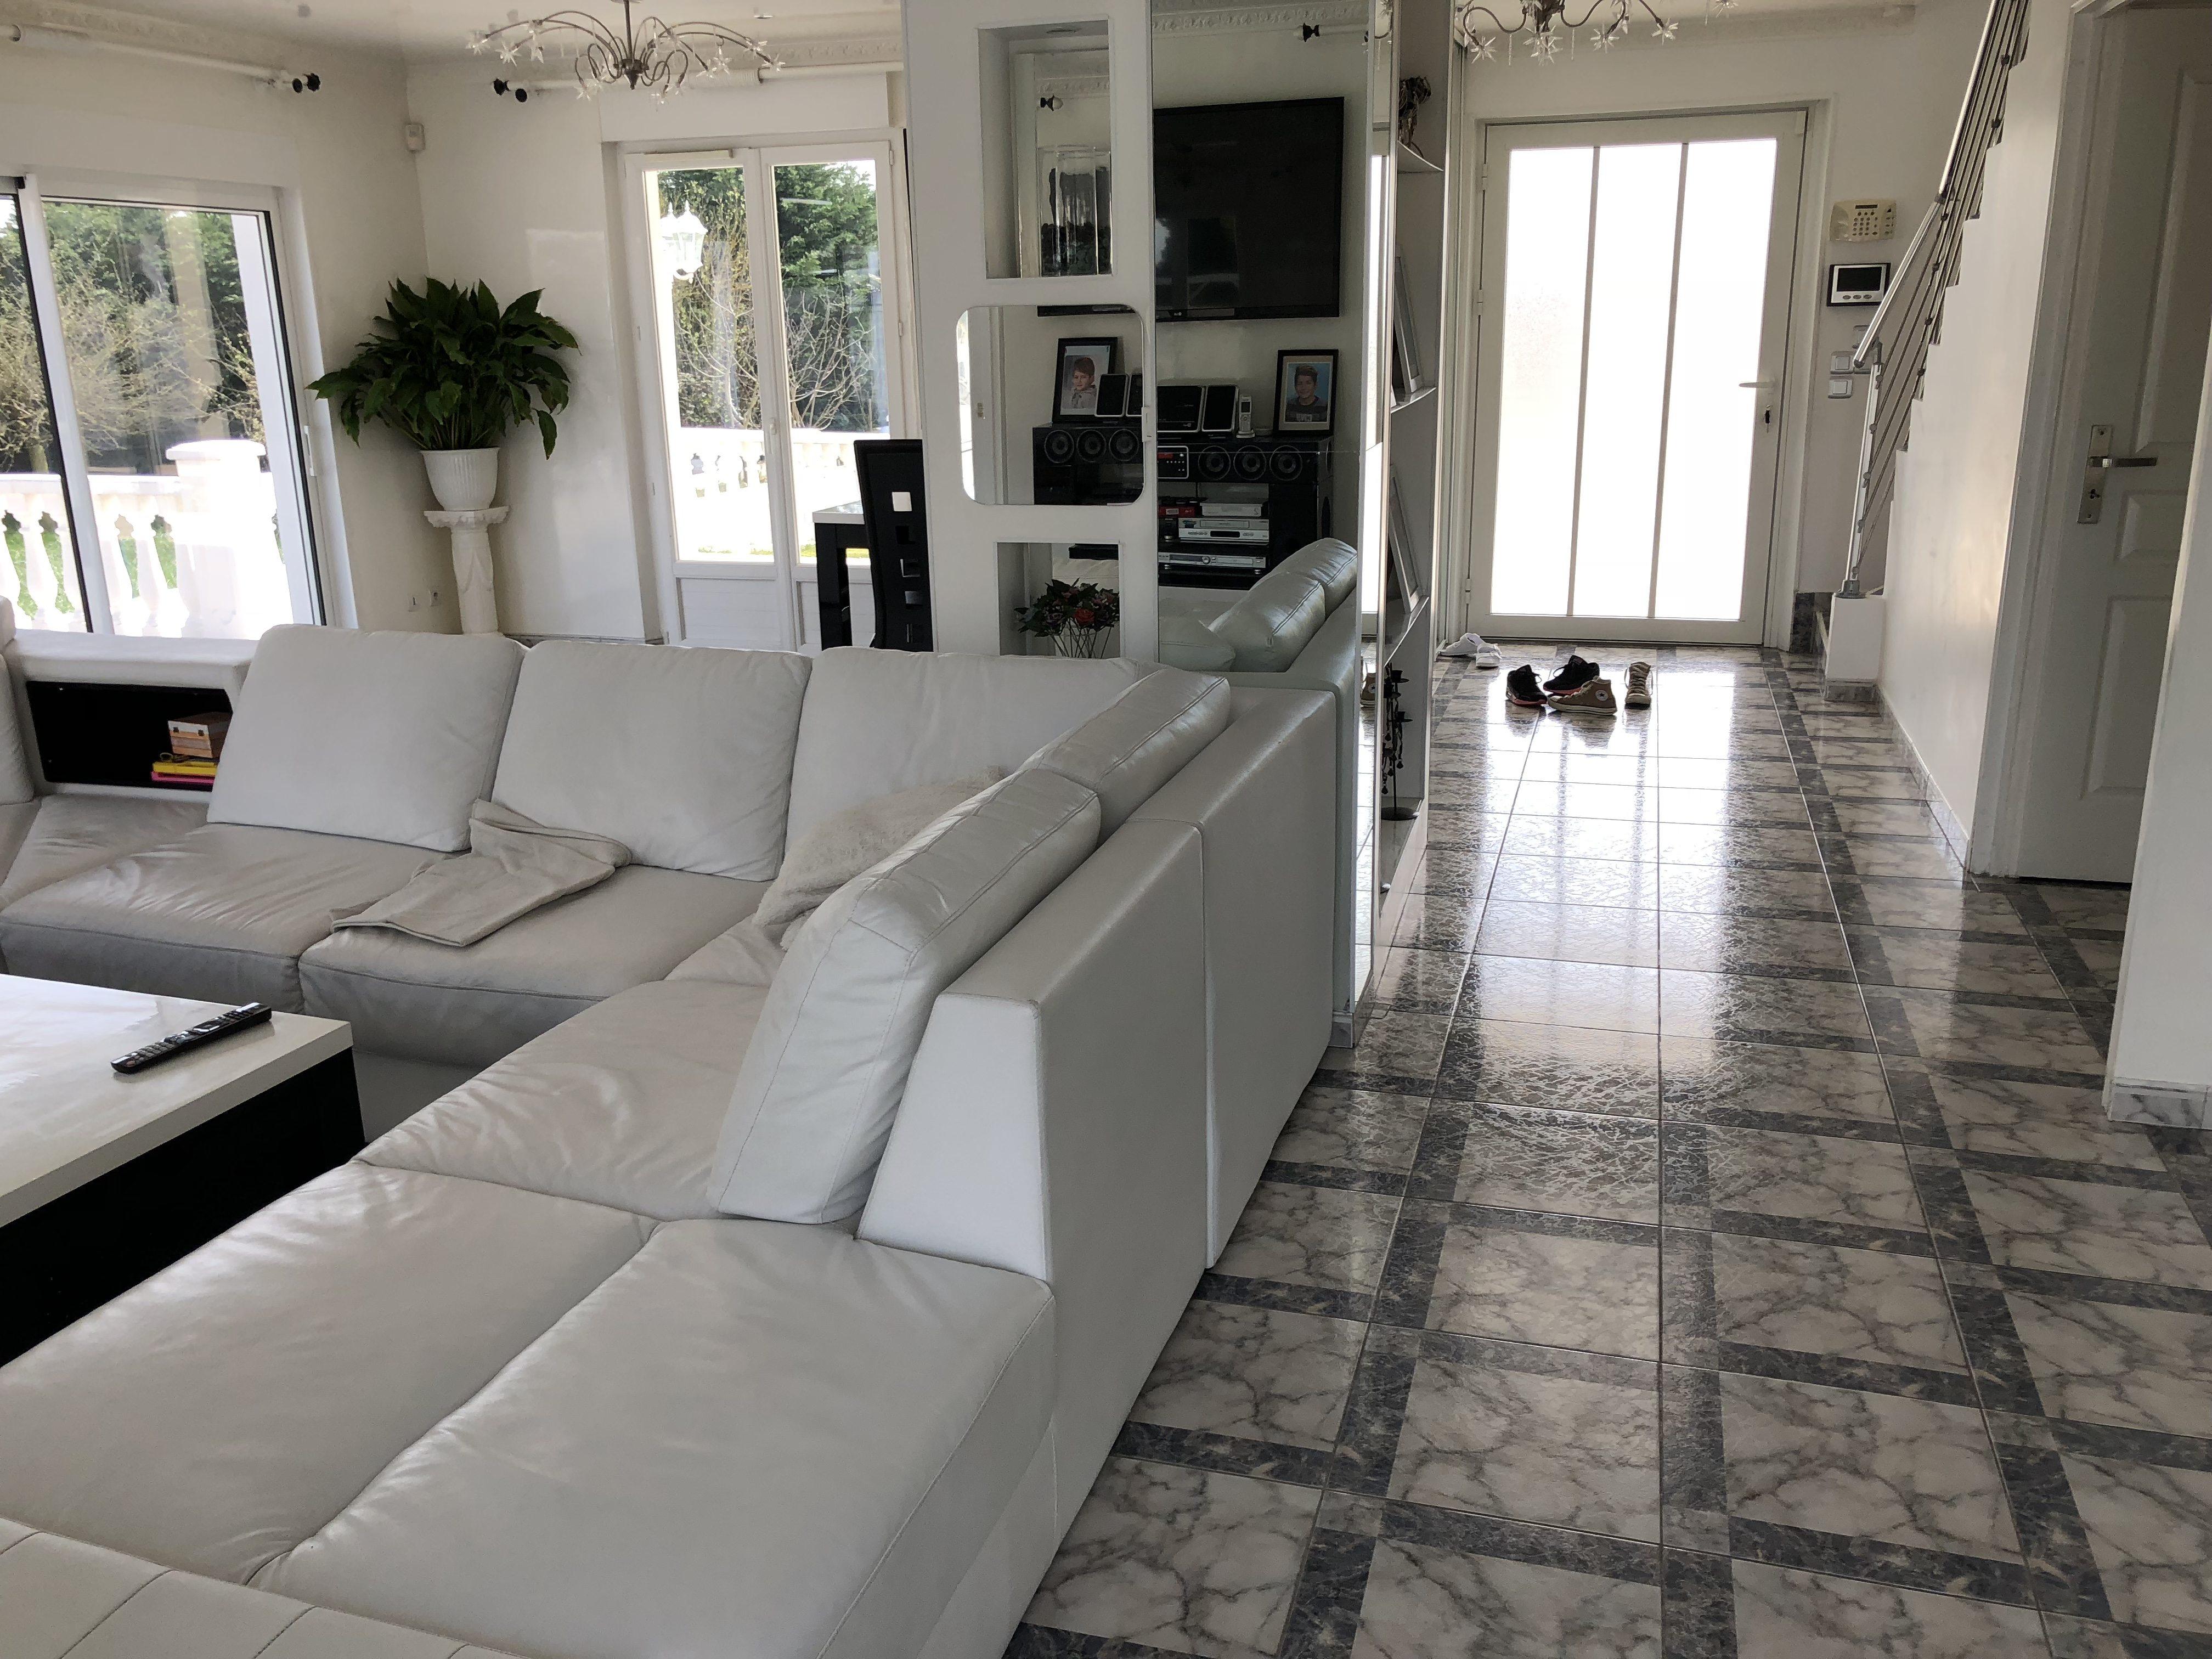 villa avec piscine val d 39 oise location tournage cin ma avec cast 39 things. Black Bedroom Furniture Sets. Home Design Ideas